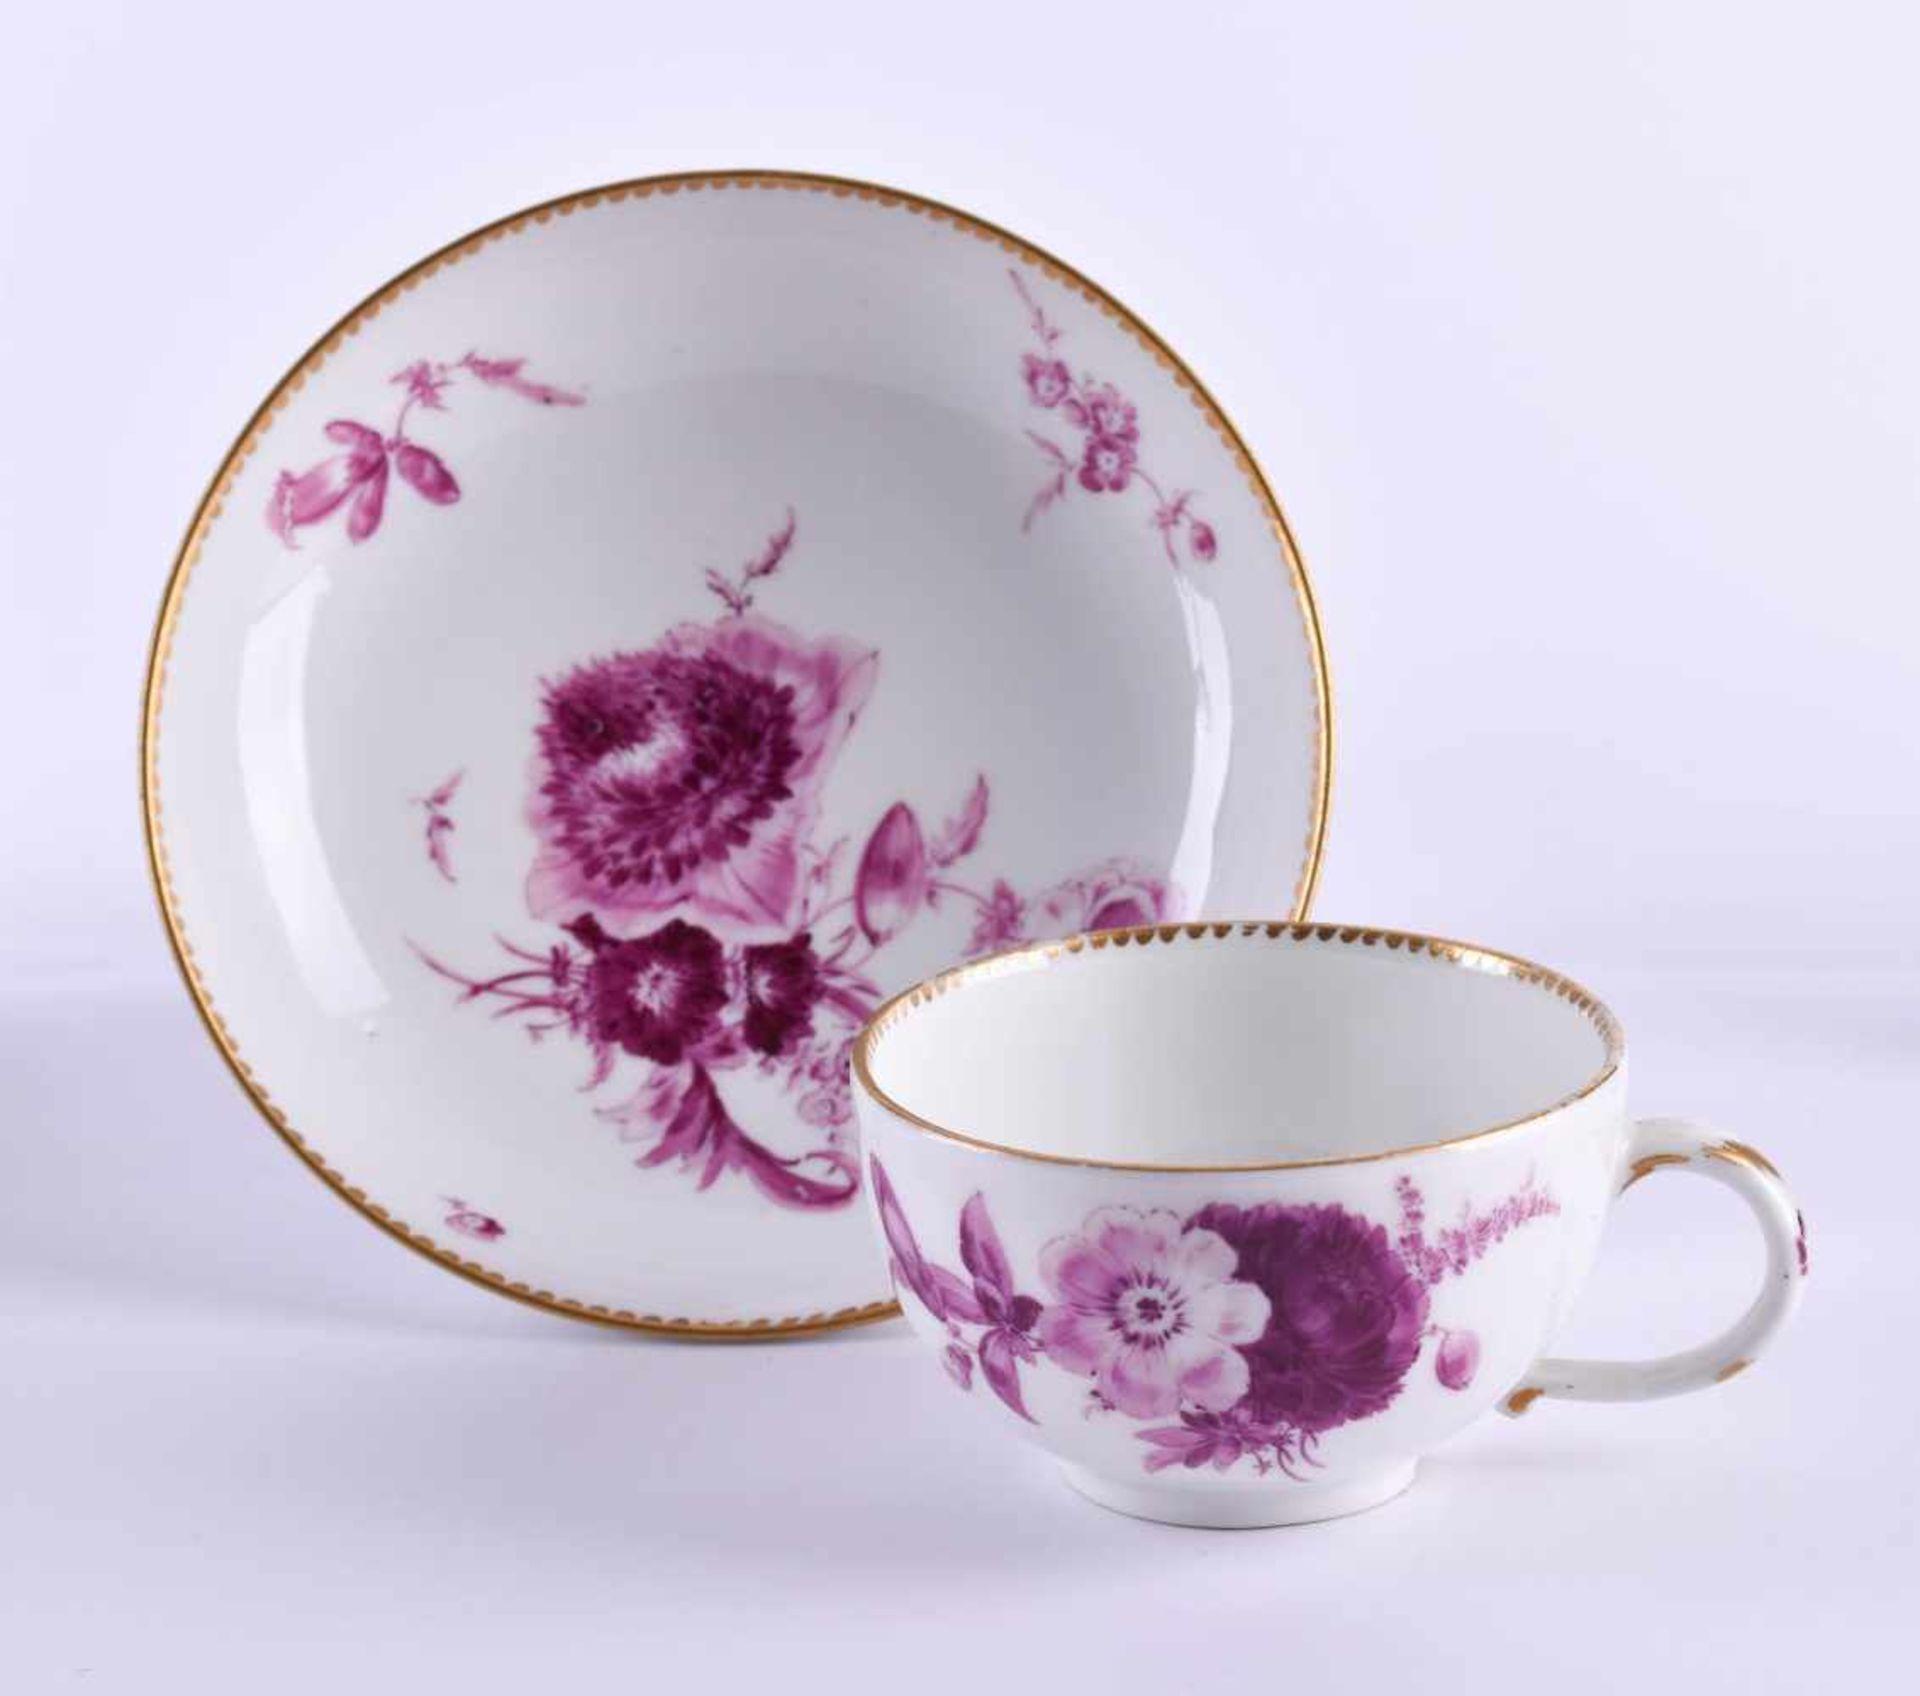 Cup & saucer Meissen 1740-80